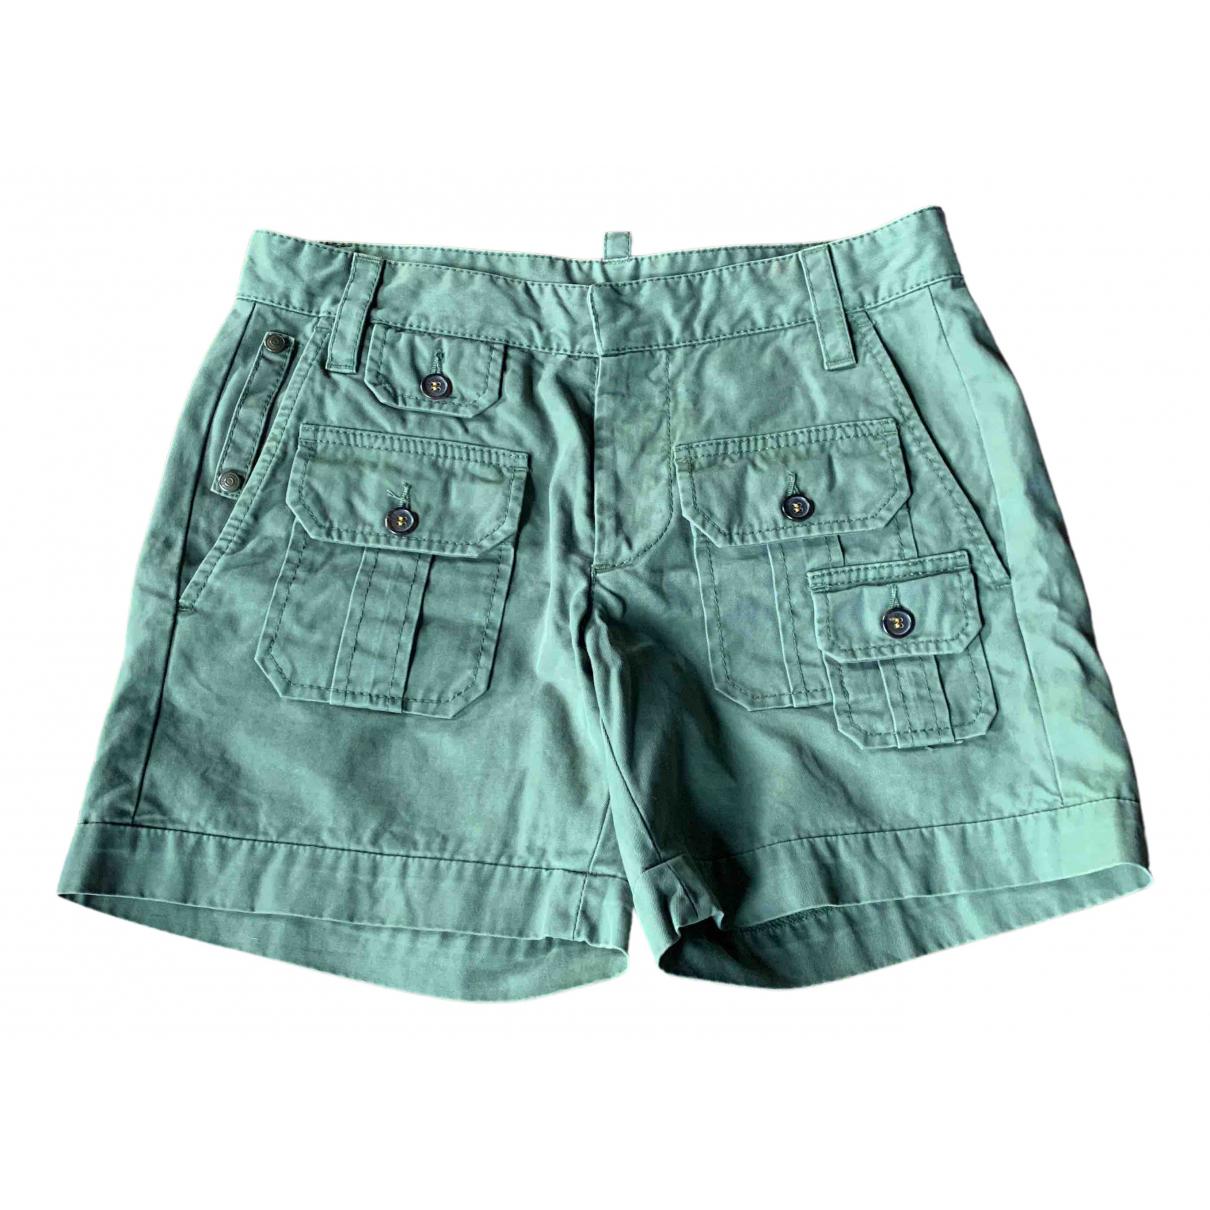 Dsquared2 \N Shorts in  Gruen Baumwolle